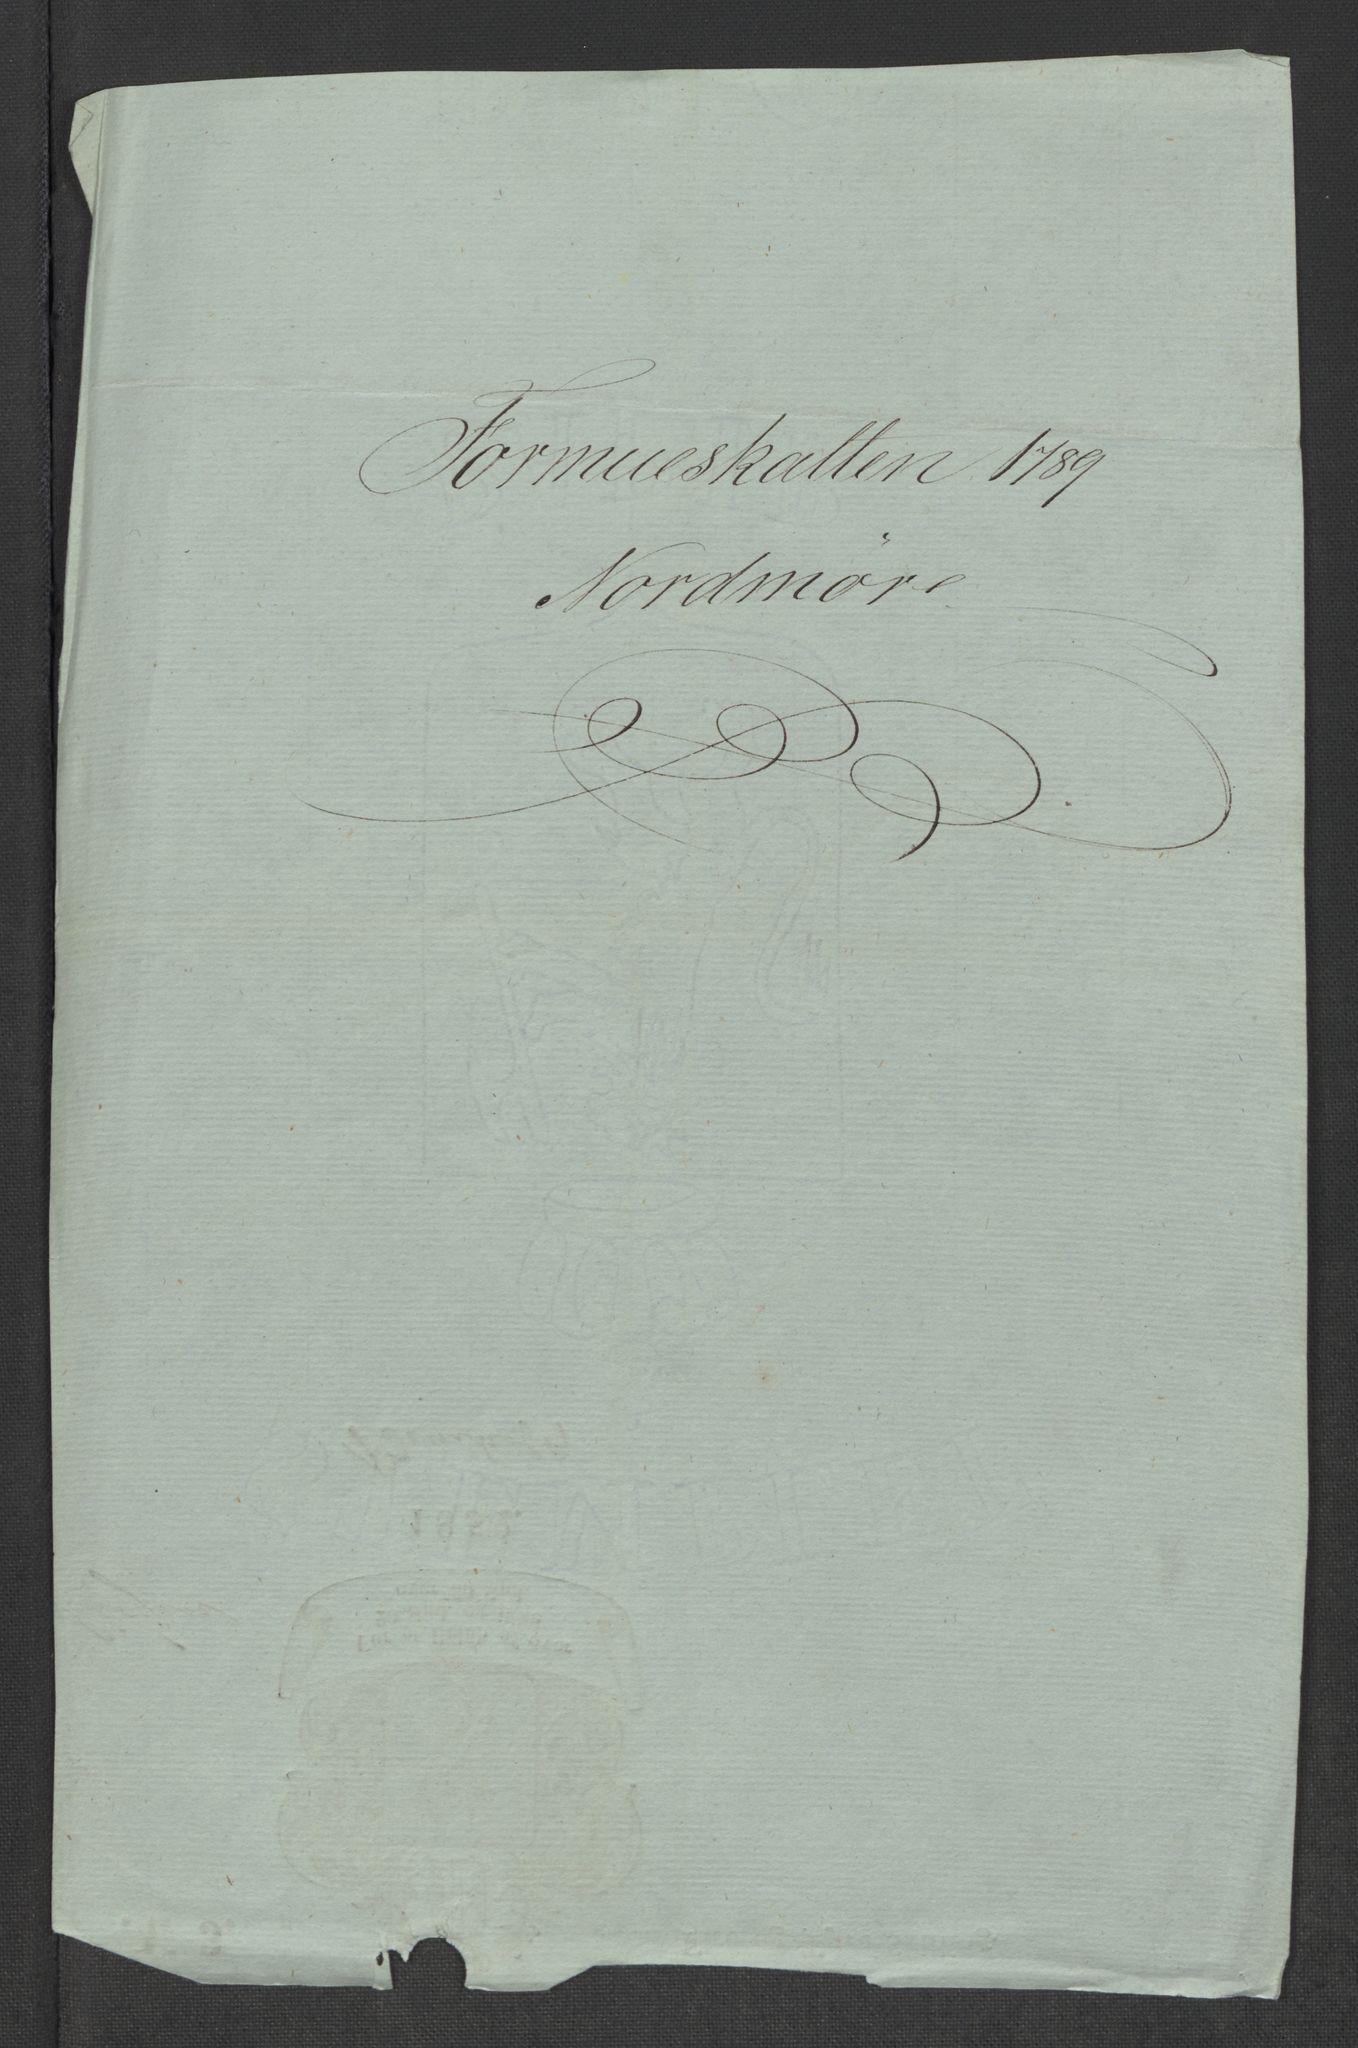 RA, Rentekammeret inntil 1814, Reviderte regnskaper, Mindre regnskaper, Rf/Rfe/L0031: Nordmøre fogderi, Numedal og Sandsvær fogderi, 1789, s. 3